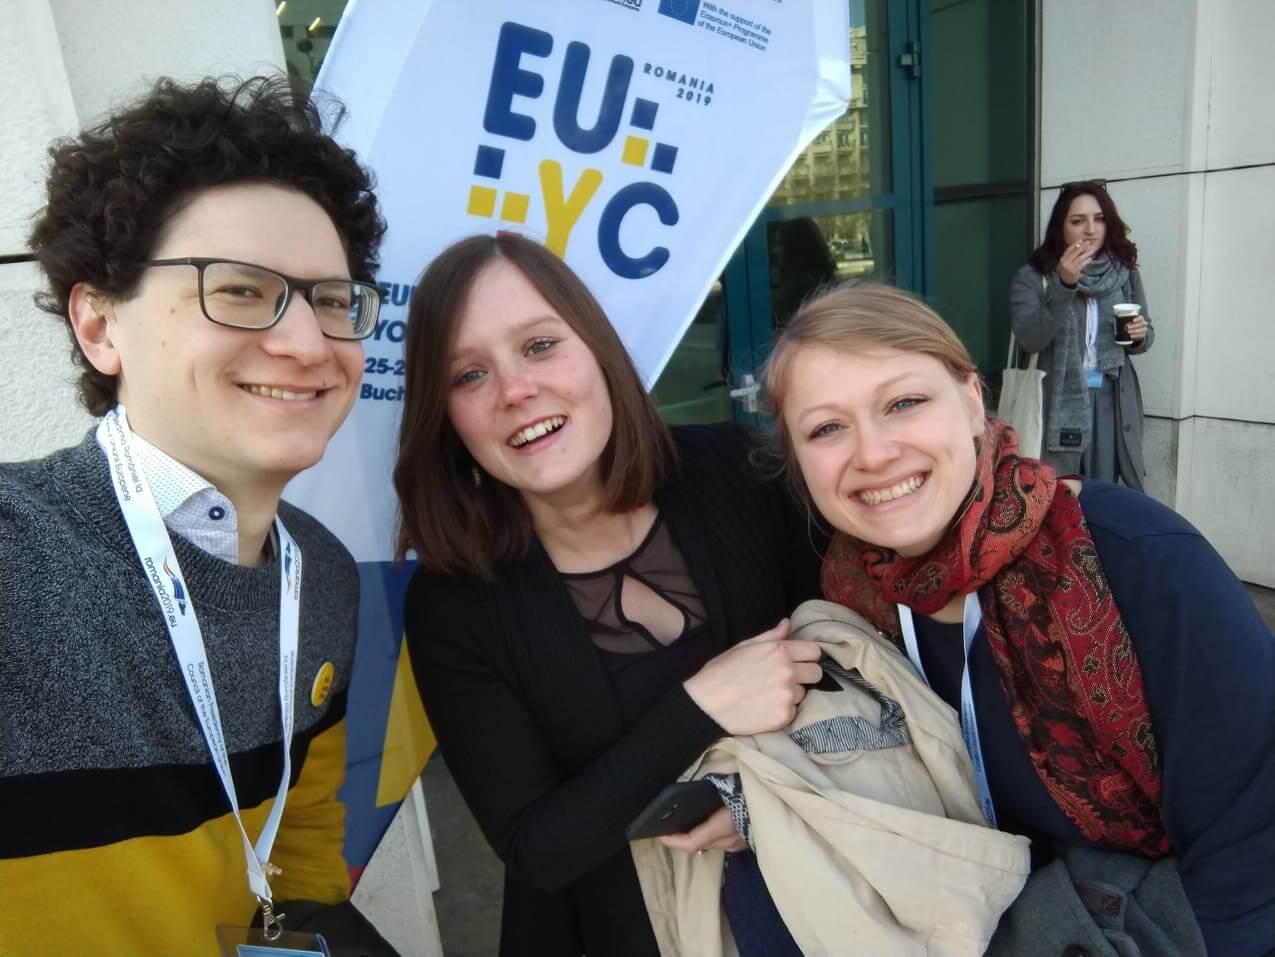 EU-Jugendkonferenz in Rumänien